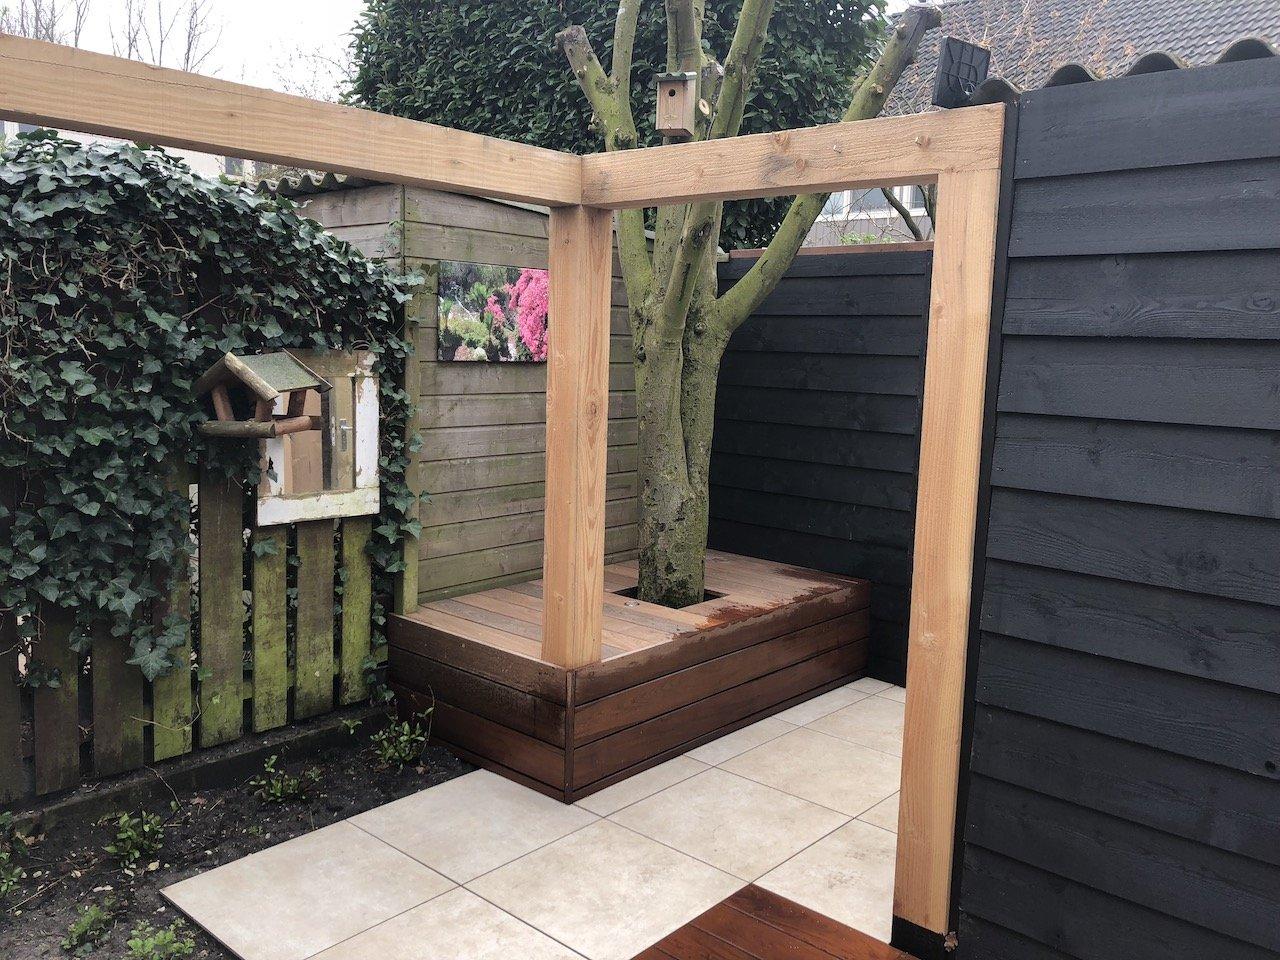 Sfeervolle kleine achtertuin met vlonder